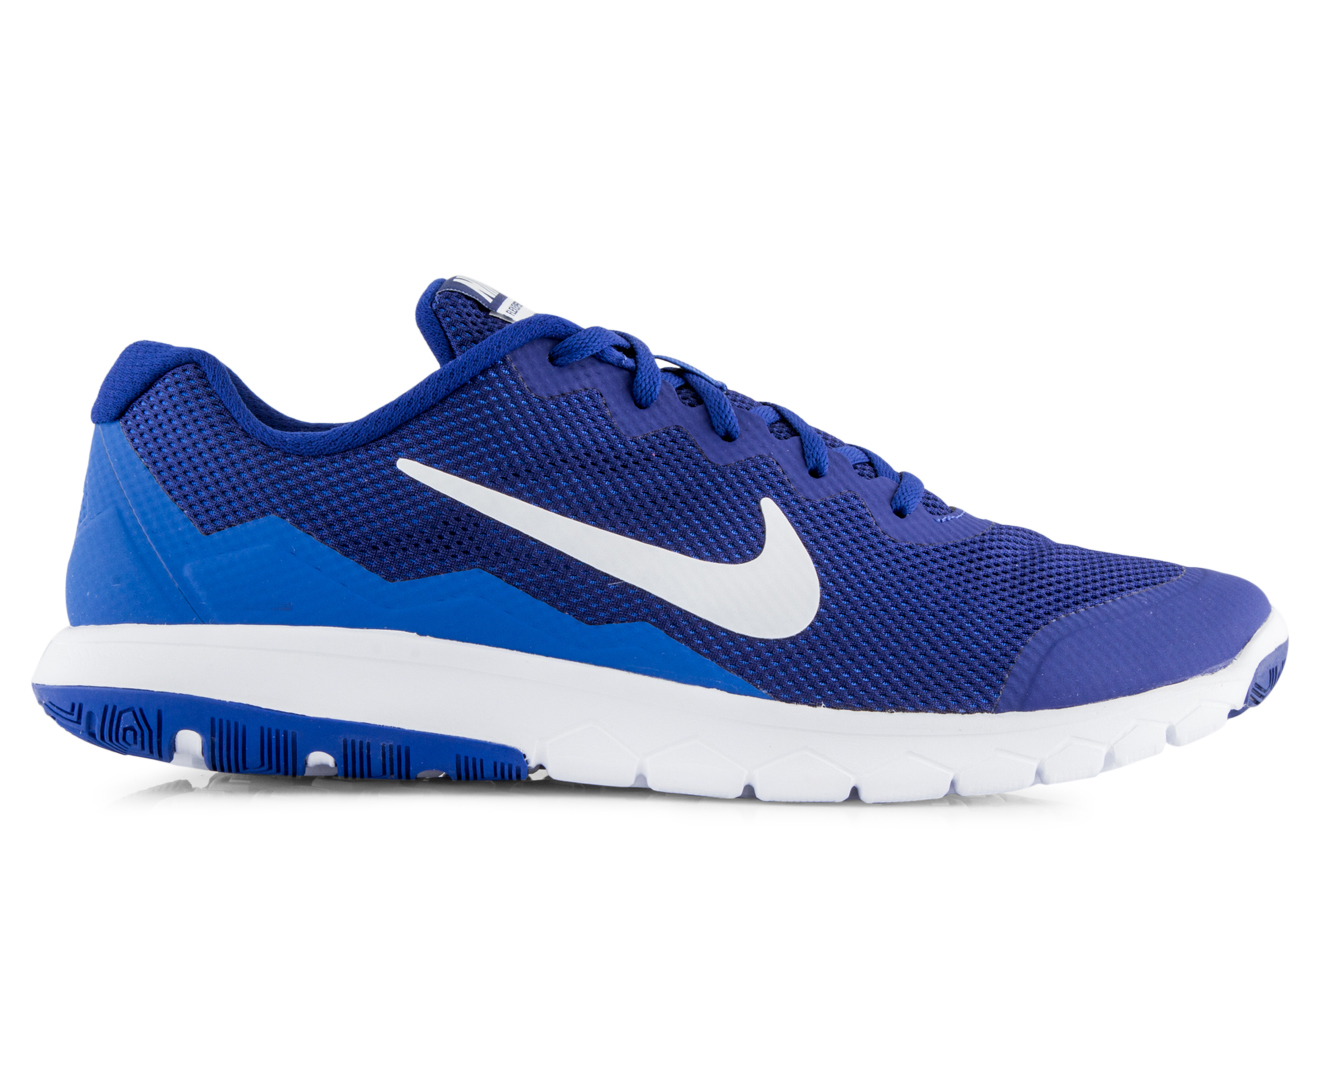 nike men 39 s flex experience rn 4 shoe deep royal blue. Black Bedroom Furniture Sets. Home Design Ideas